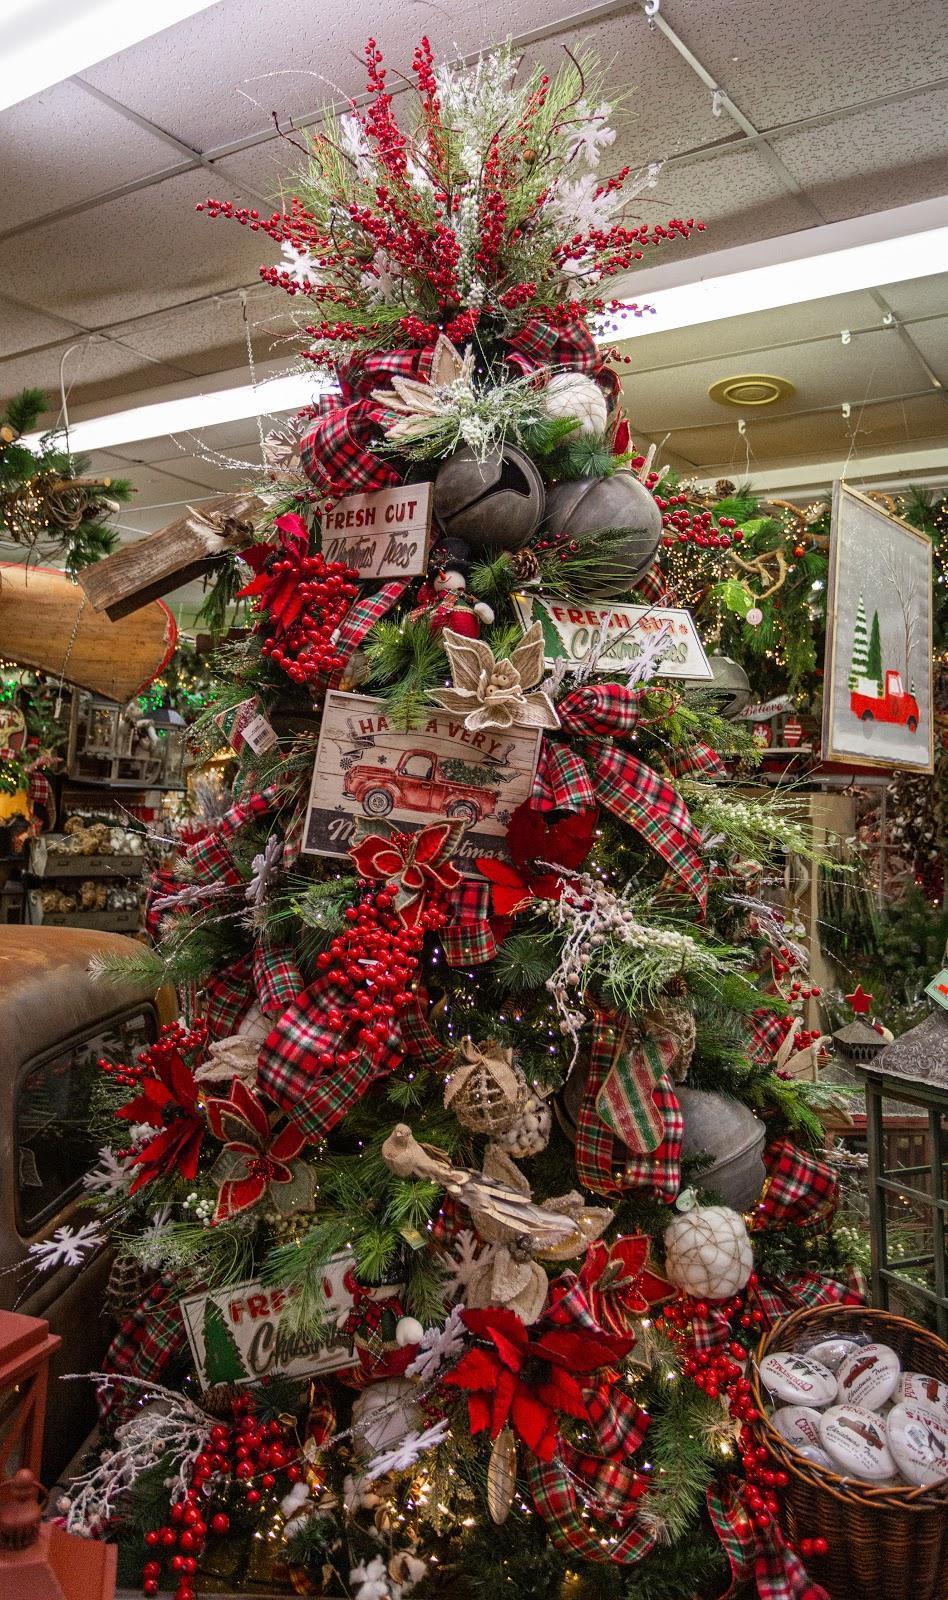 Christmas Decorating Trends 2020: Christmas Decorating Trends 2020: Παραδοσιακός στολισμός χριστουγεννιάτικου δέντρου